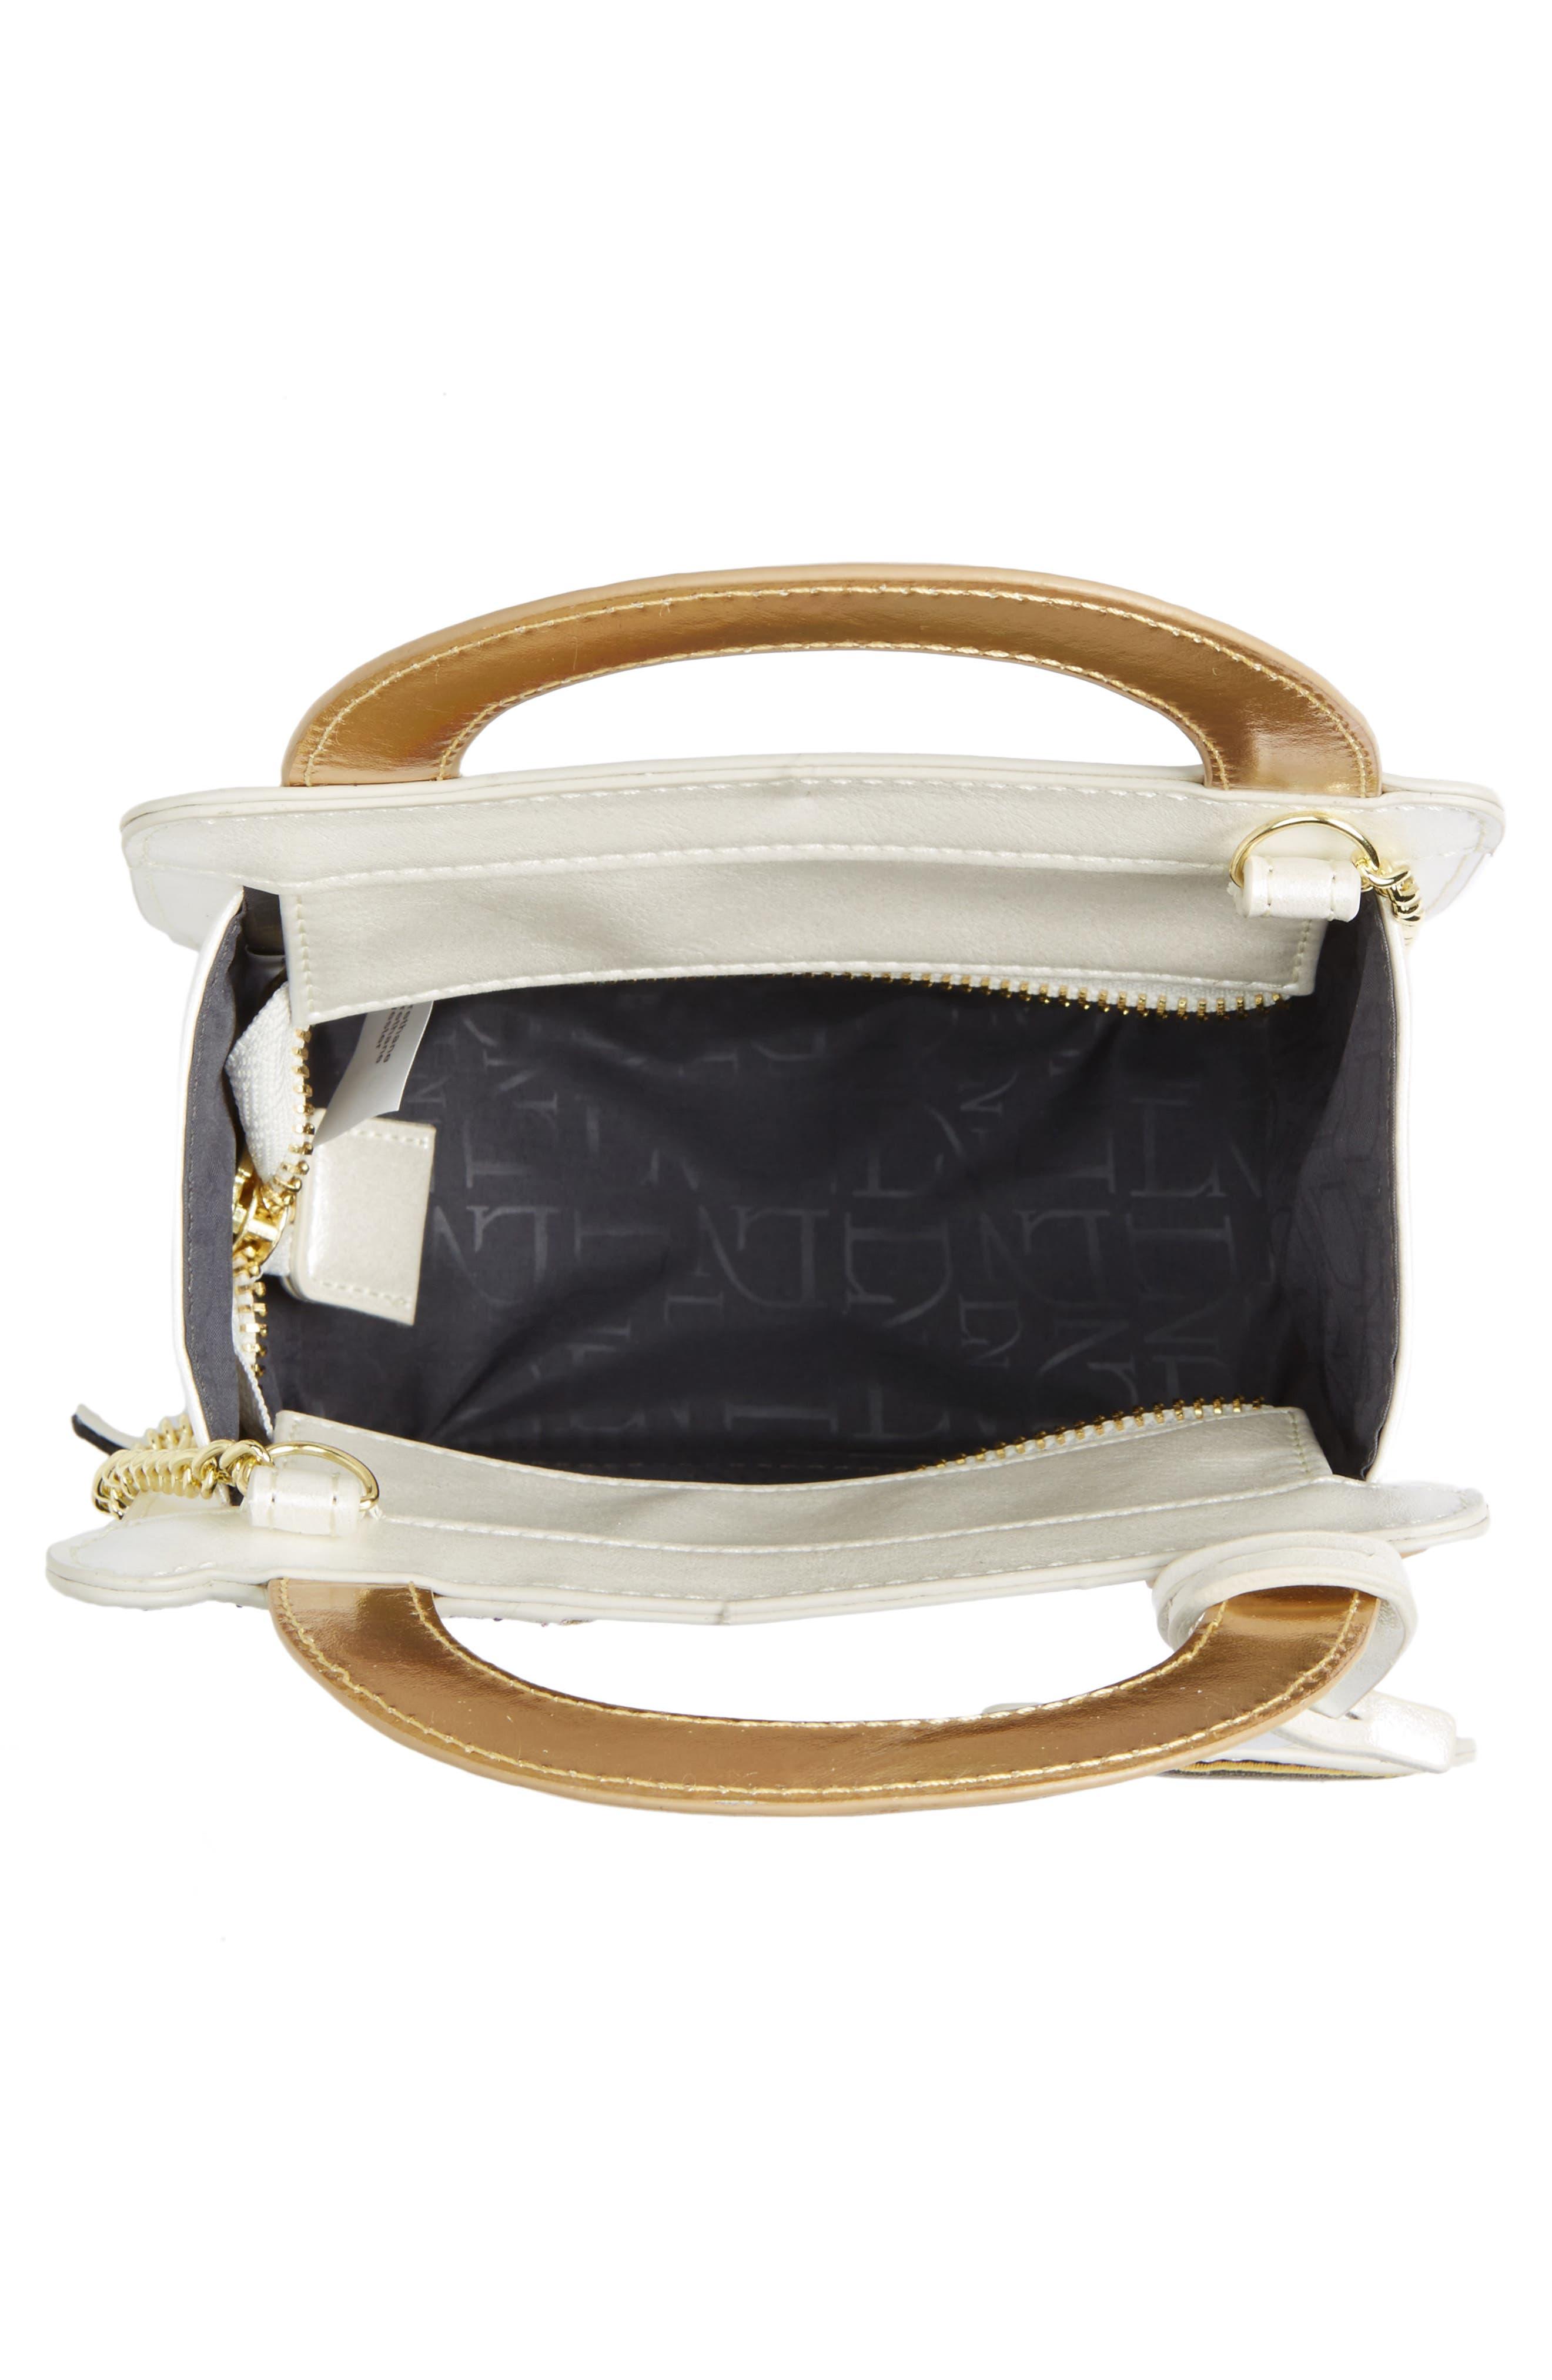 DANIELLE NICOLE,                             x Disney<sup>®</sup> Mrs. Potts & Chip Faux Leather Crossbody Bag,                             Alternate thumbnail 4, color,                             040